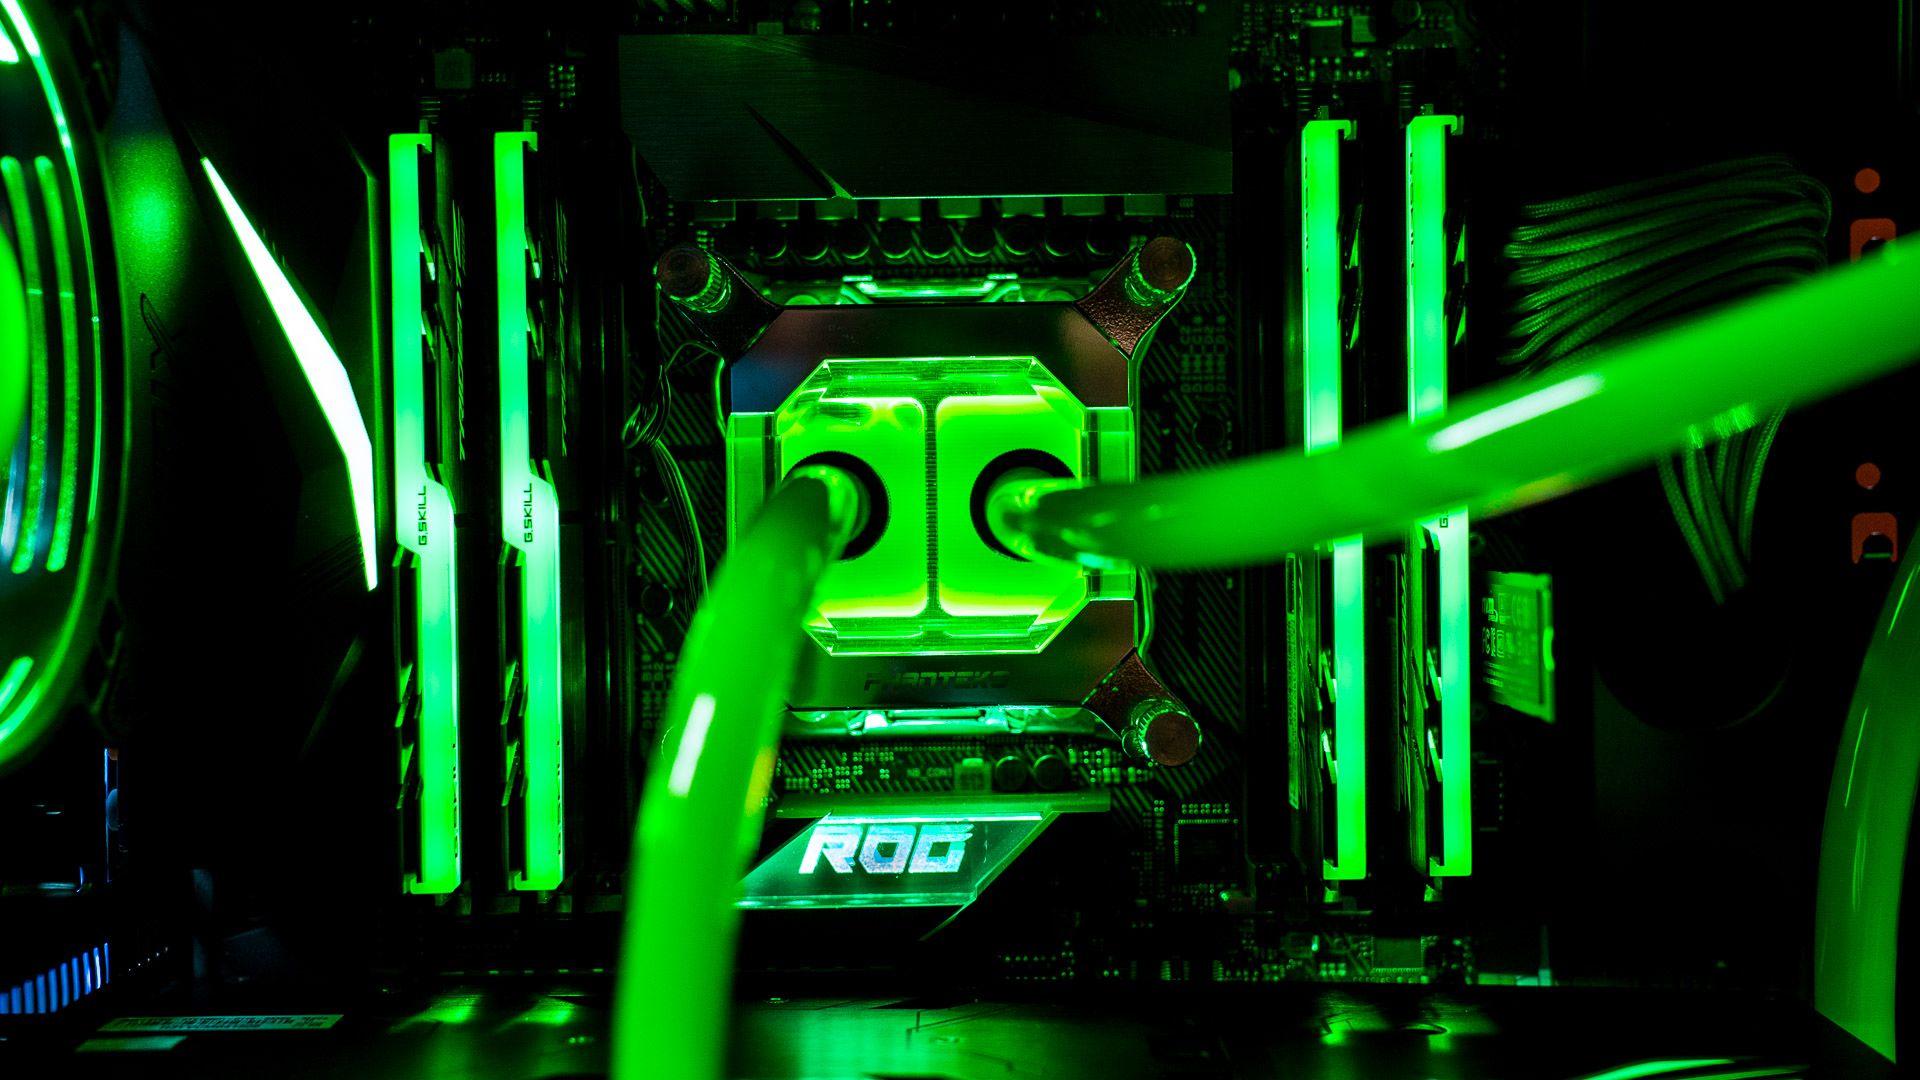 Neon Green Aesthetic Wallpapers - Wallpaper Cave